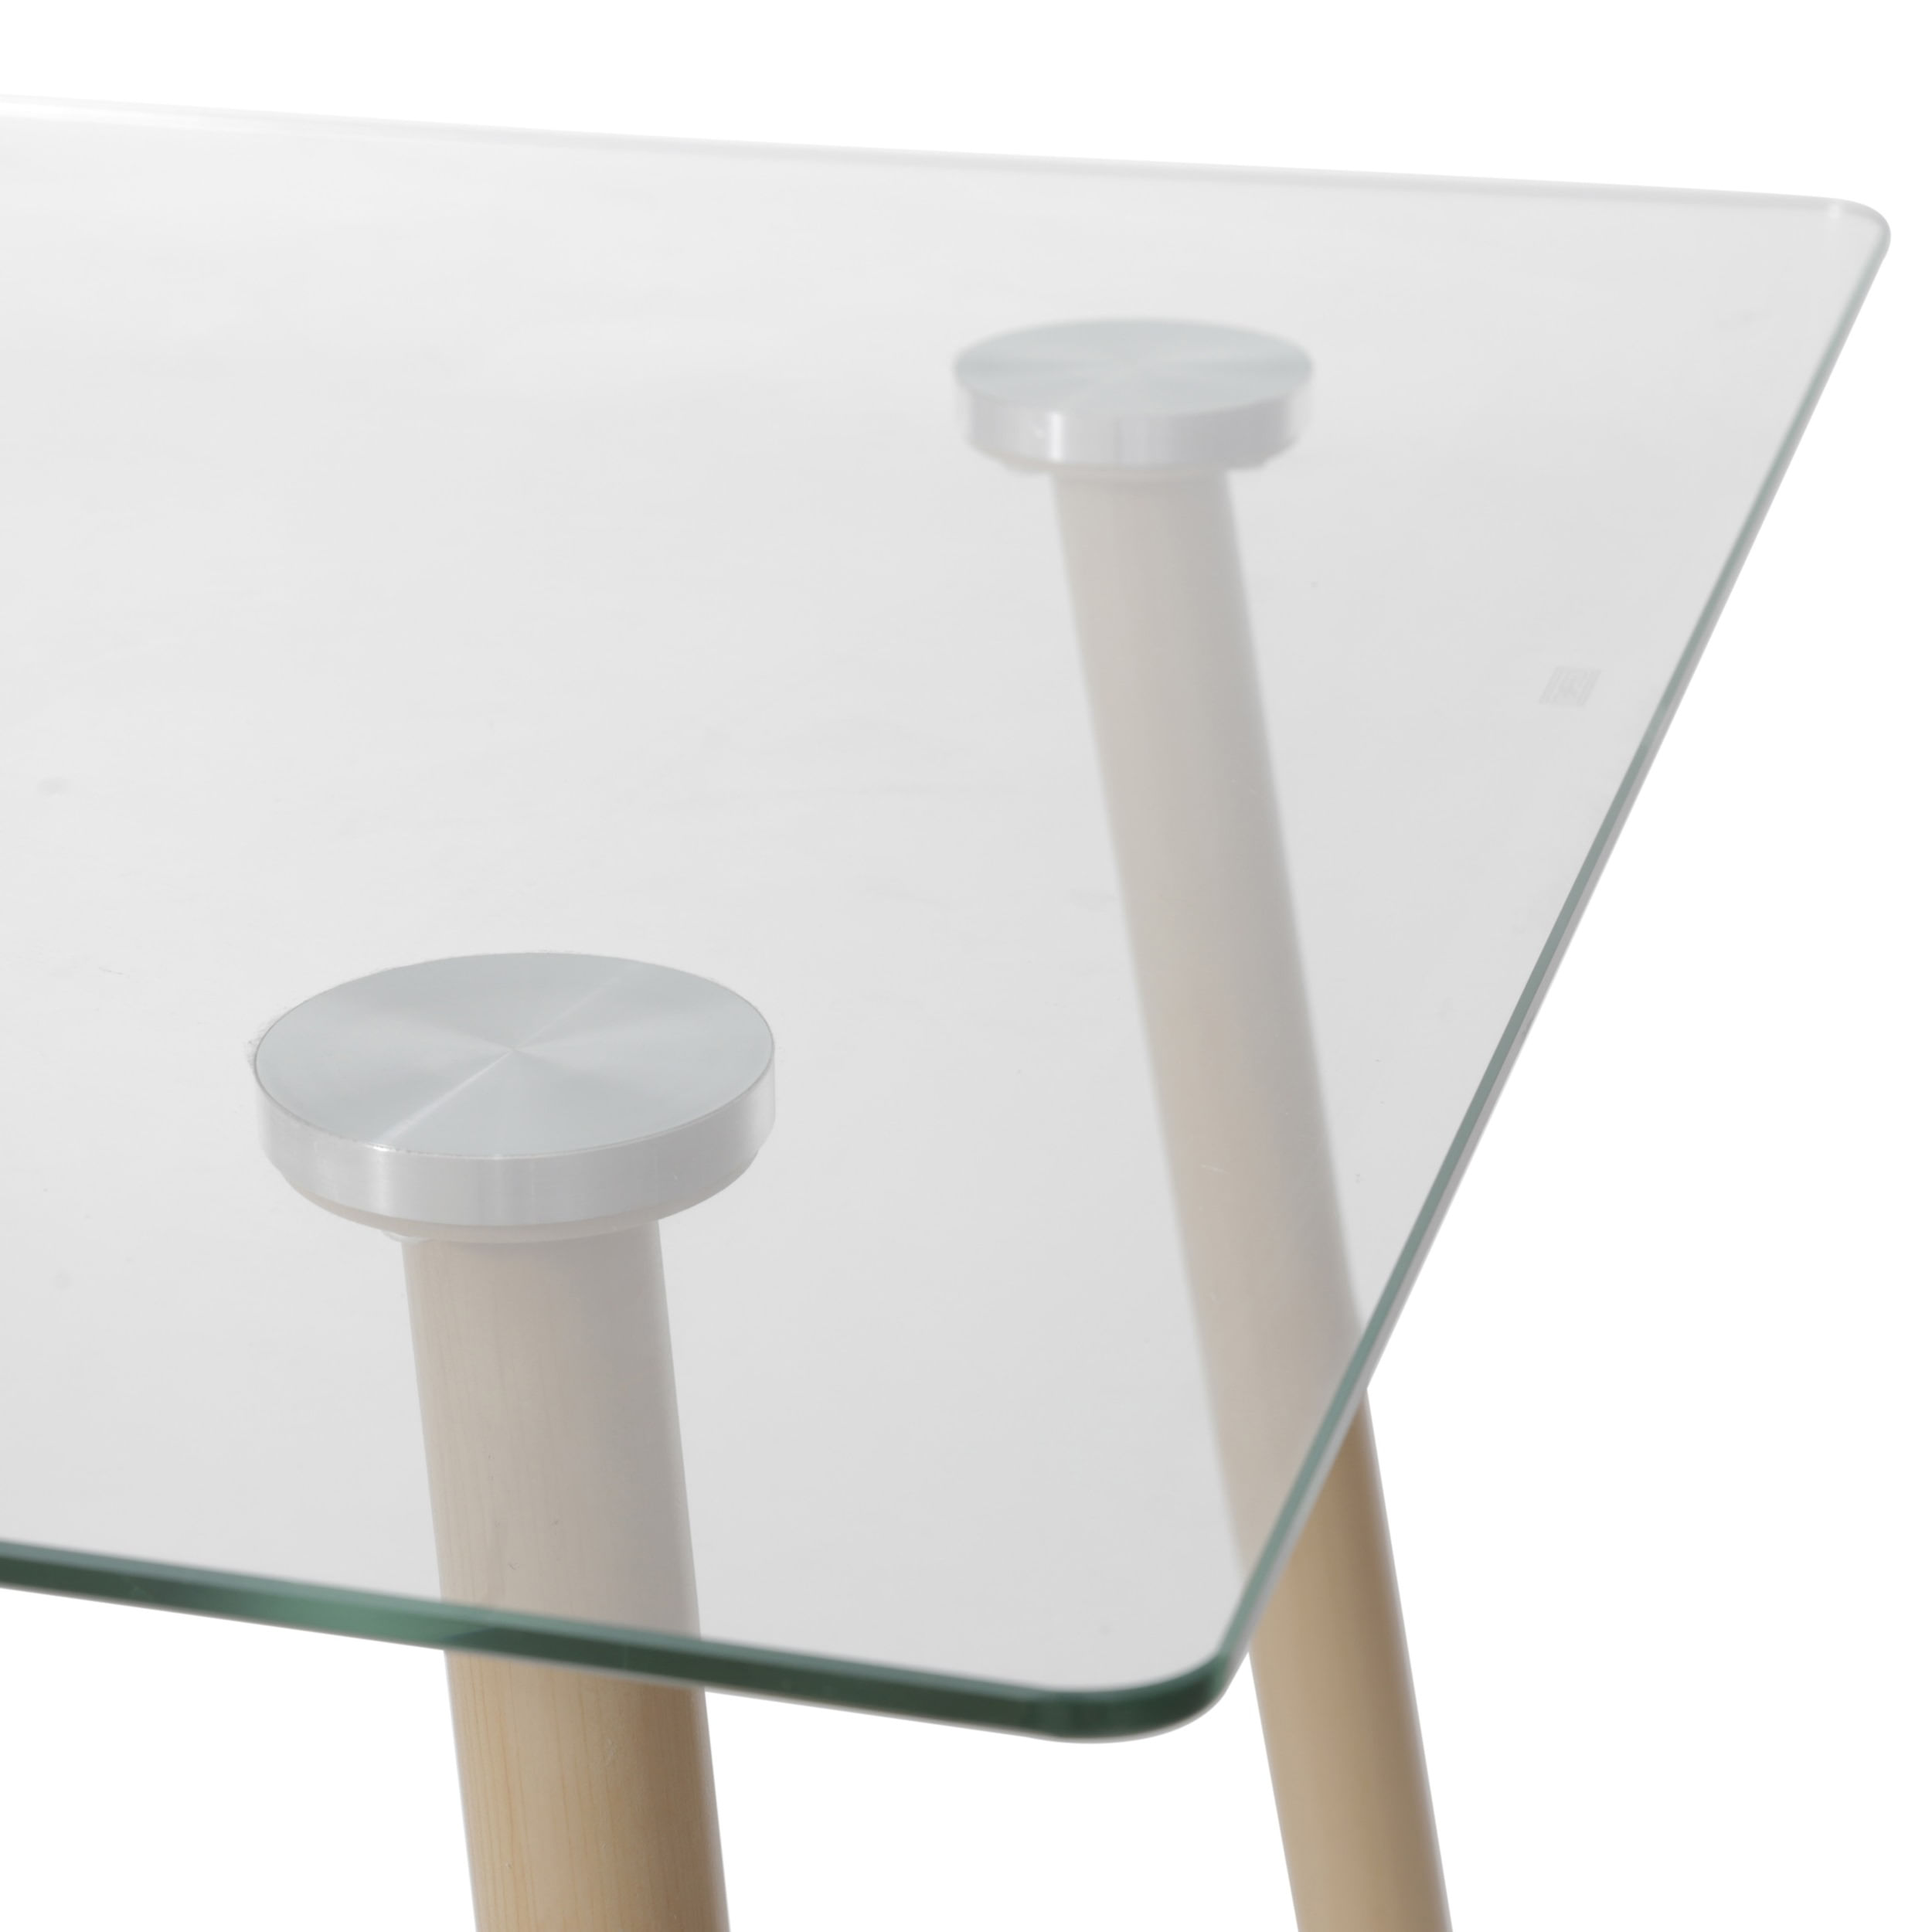 Mesa de Jantar Moderninha em Aco cor Mel 1,20MT (LARG) - 51846